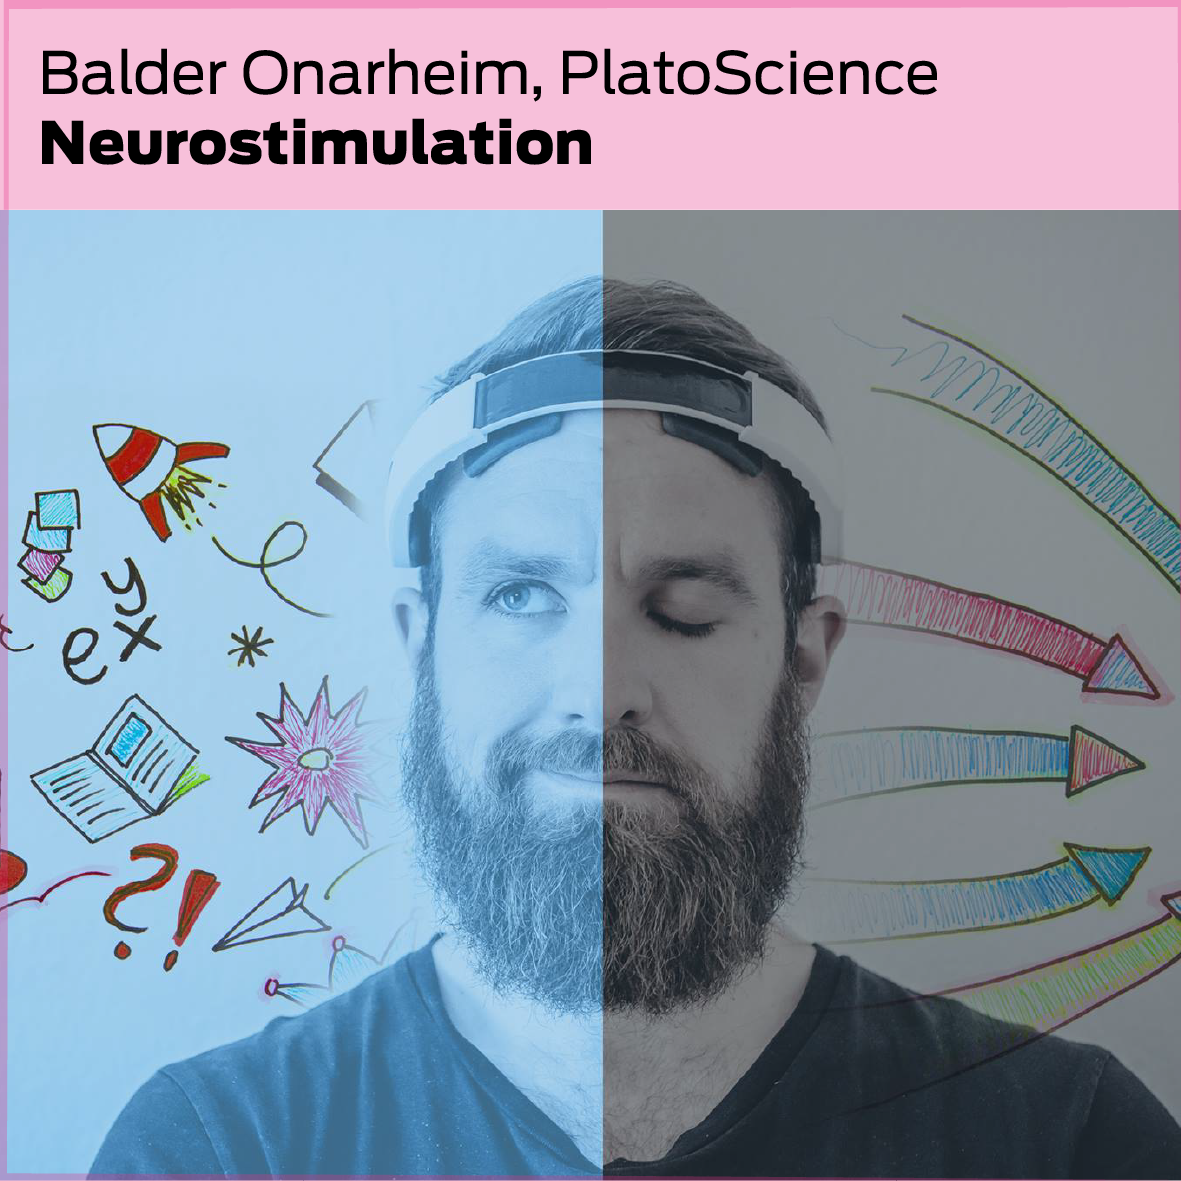 Balder Onarheim, PlatoScience (DK): Neurostimulation